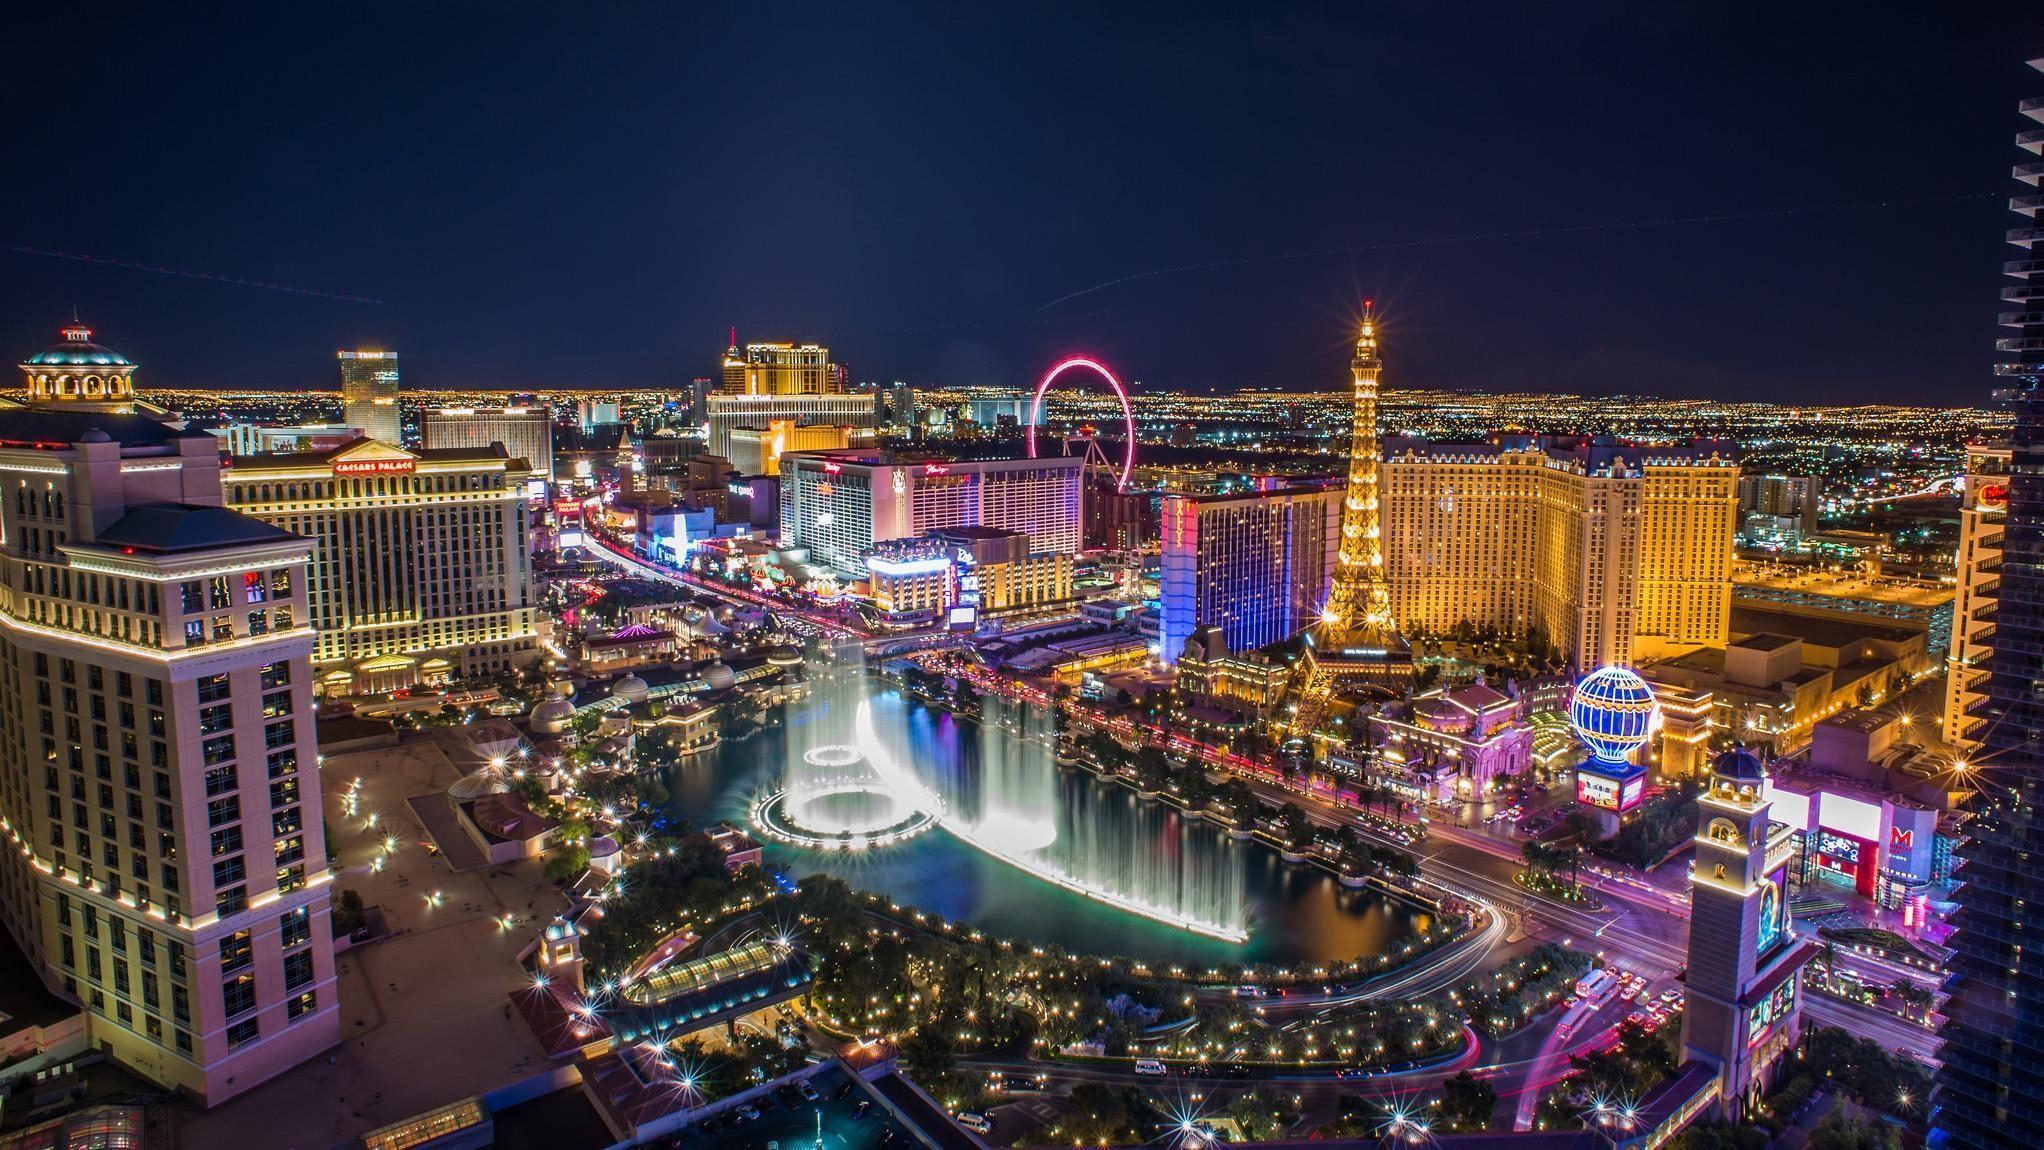 Las Vegas wallpaper Download beautiful HD wallpapers of 2044x1150